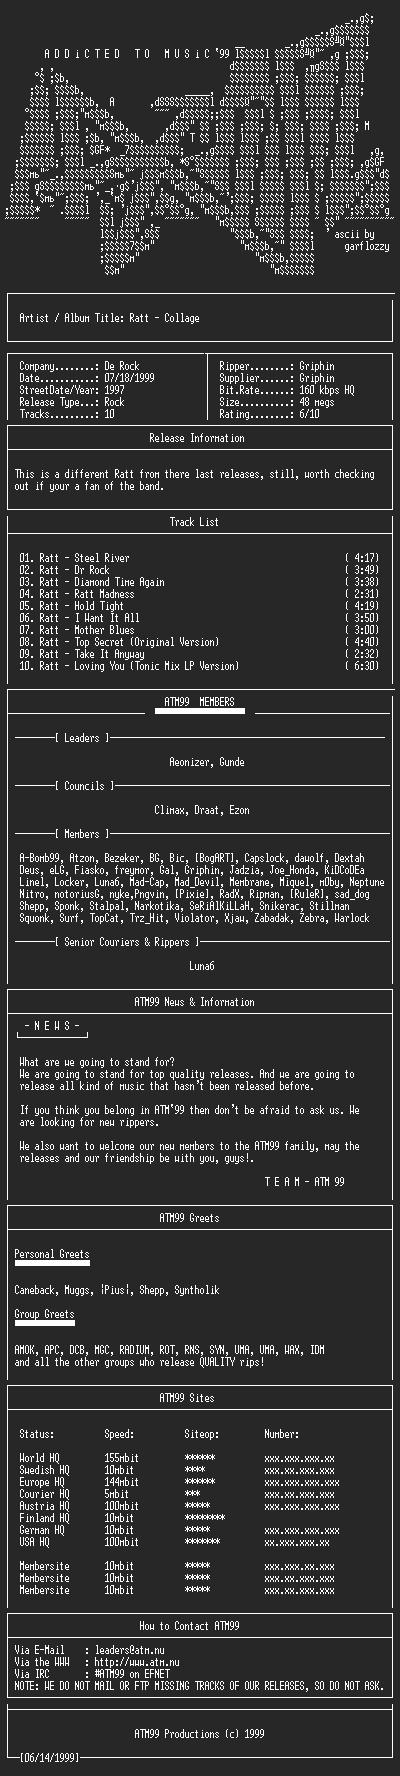 NFO file for Ratt_-_Collage_-_(1997)-ATM99